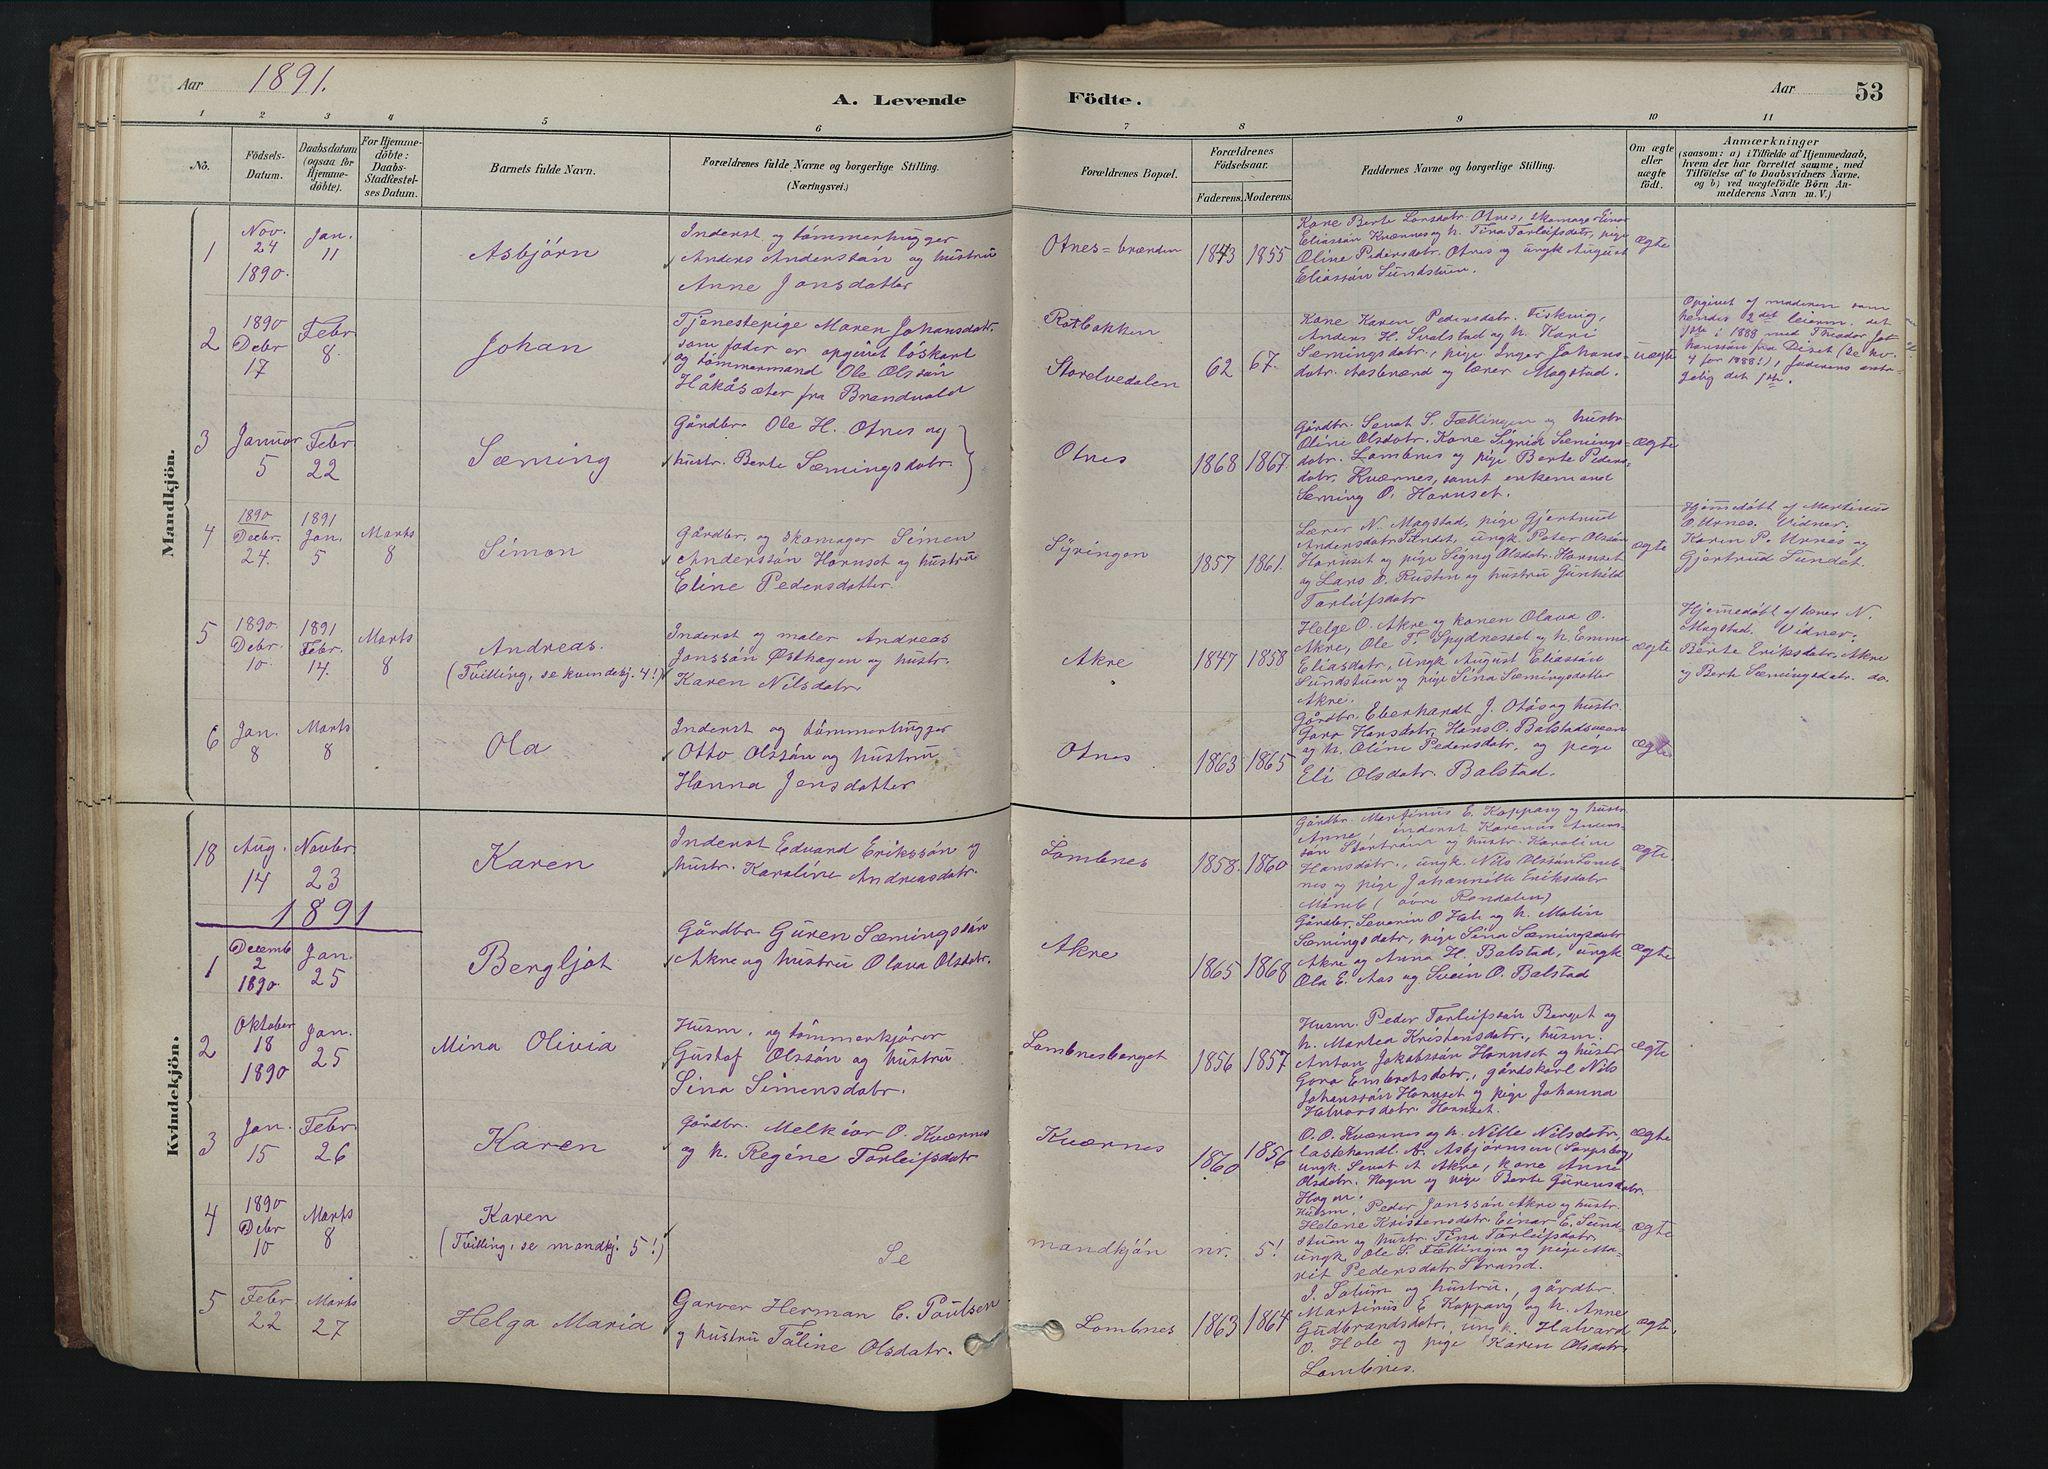 SAH, Rendalen prestekontor, H/Ha/Hab/L0009: Parish register (copy) no. 9, 1879-1902, p. 53